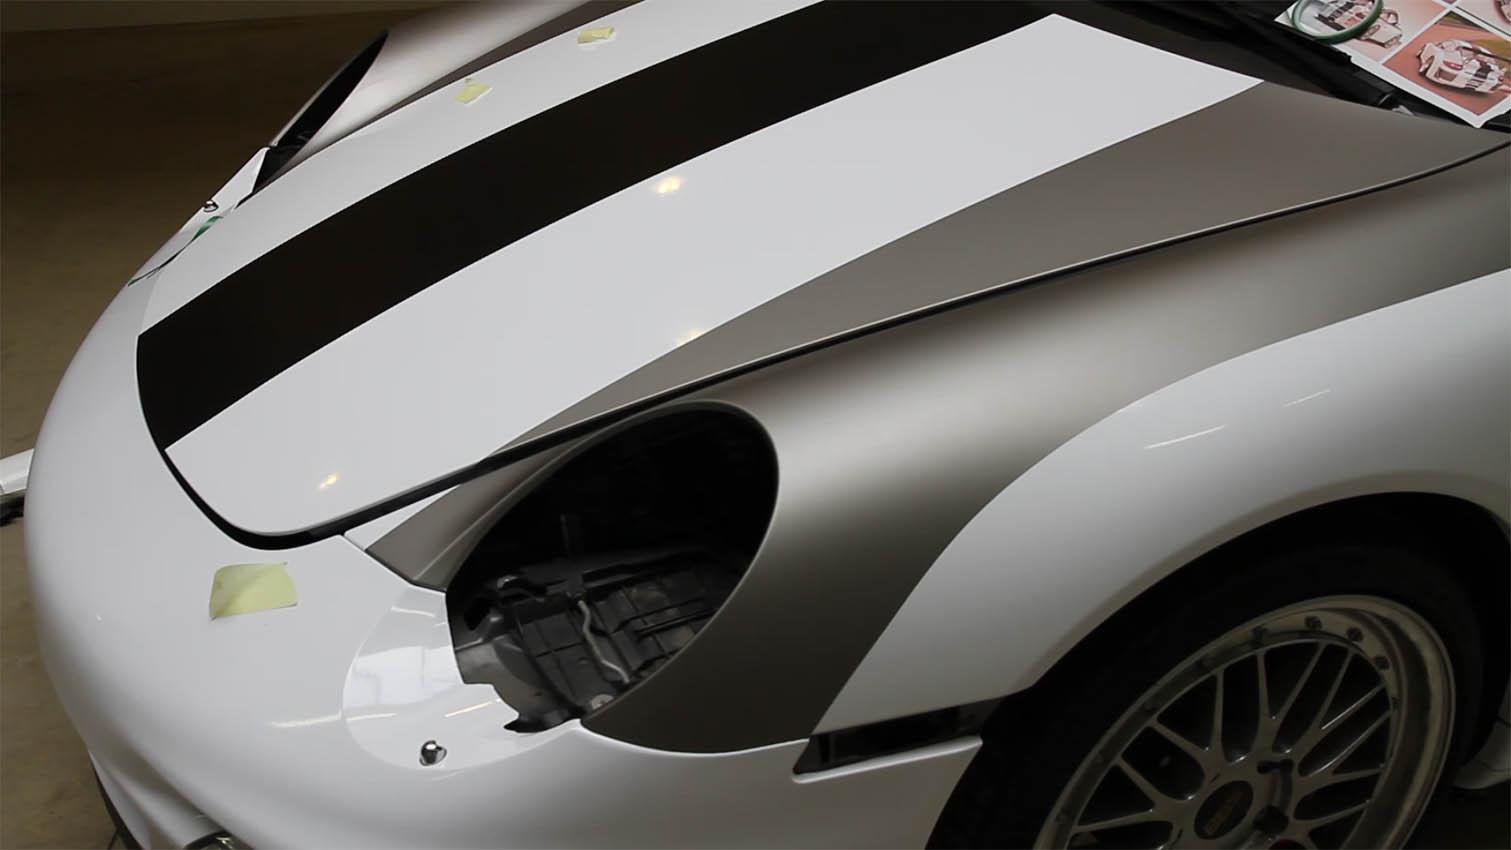 Porsche+Turbo+3+color138.jpg